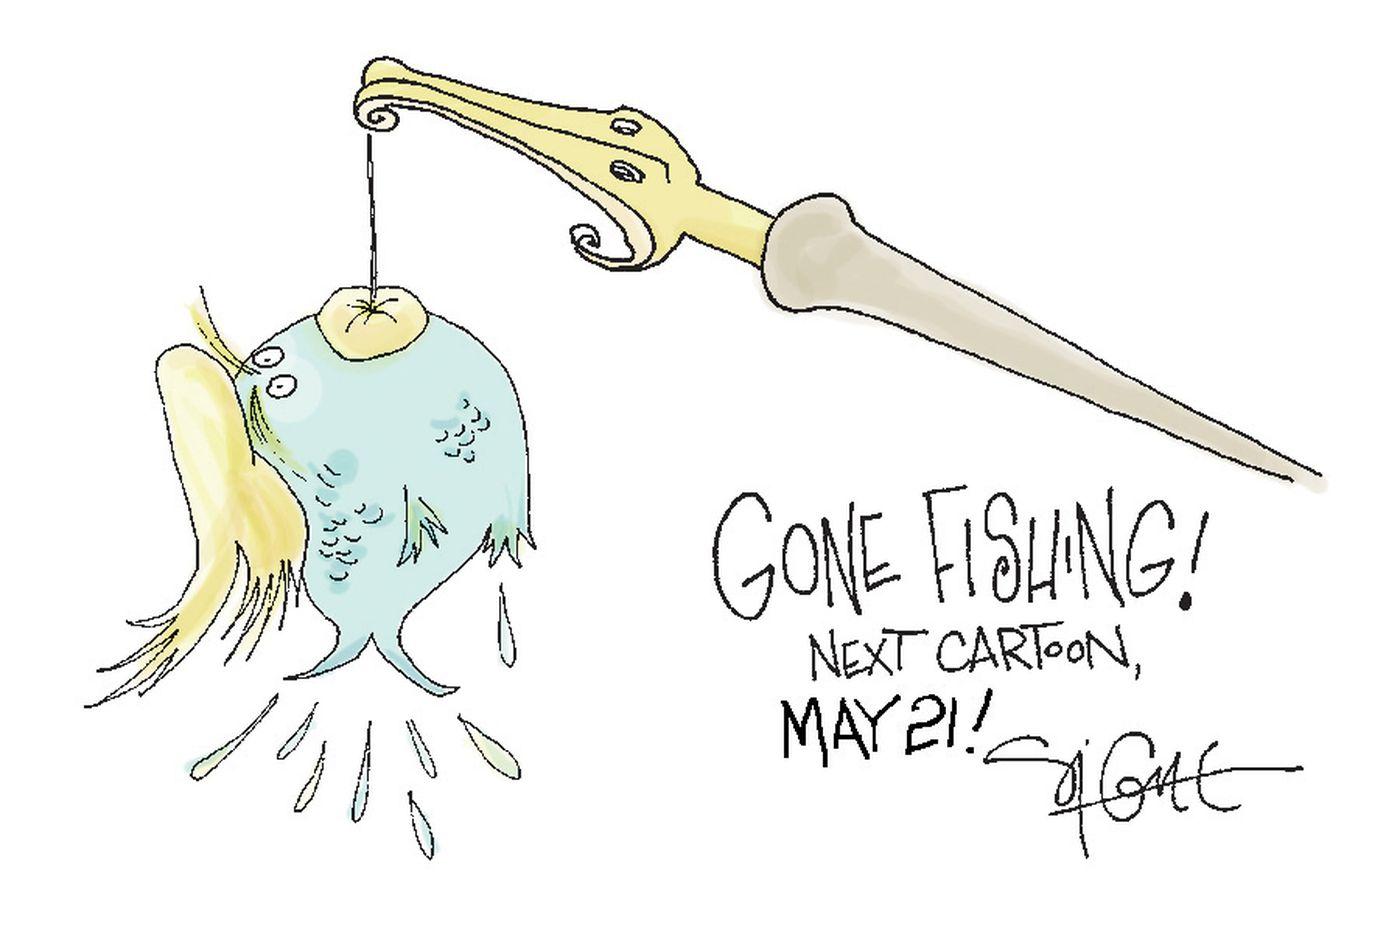 Cartoon: On vacation